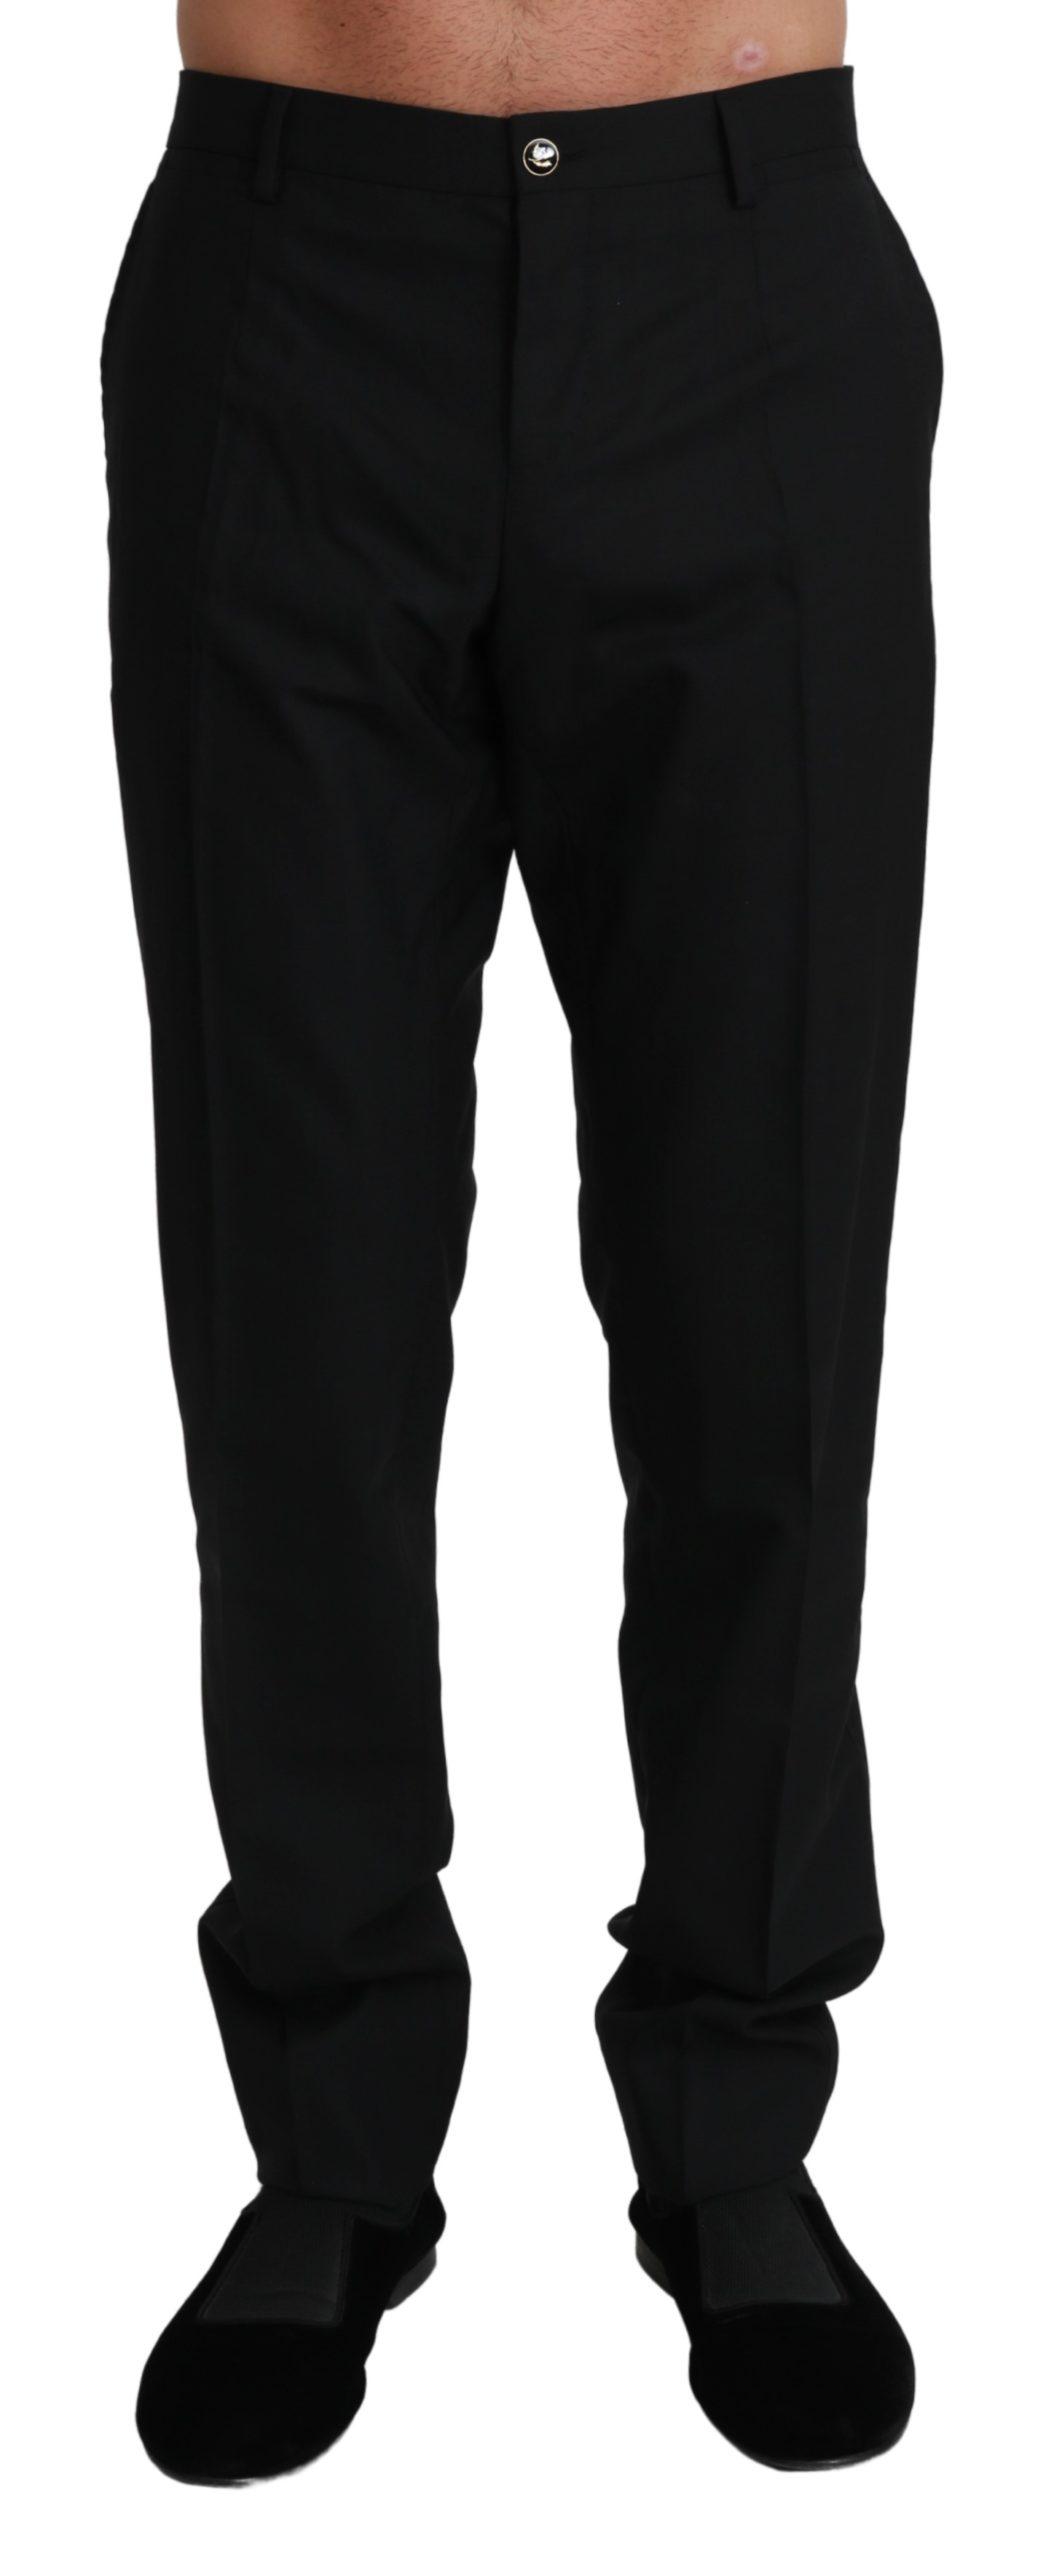 Dolce & Gabbana Men's Formal Dress Virgin Wool Trouser Black PAN71004 - IT50 | L